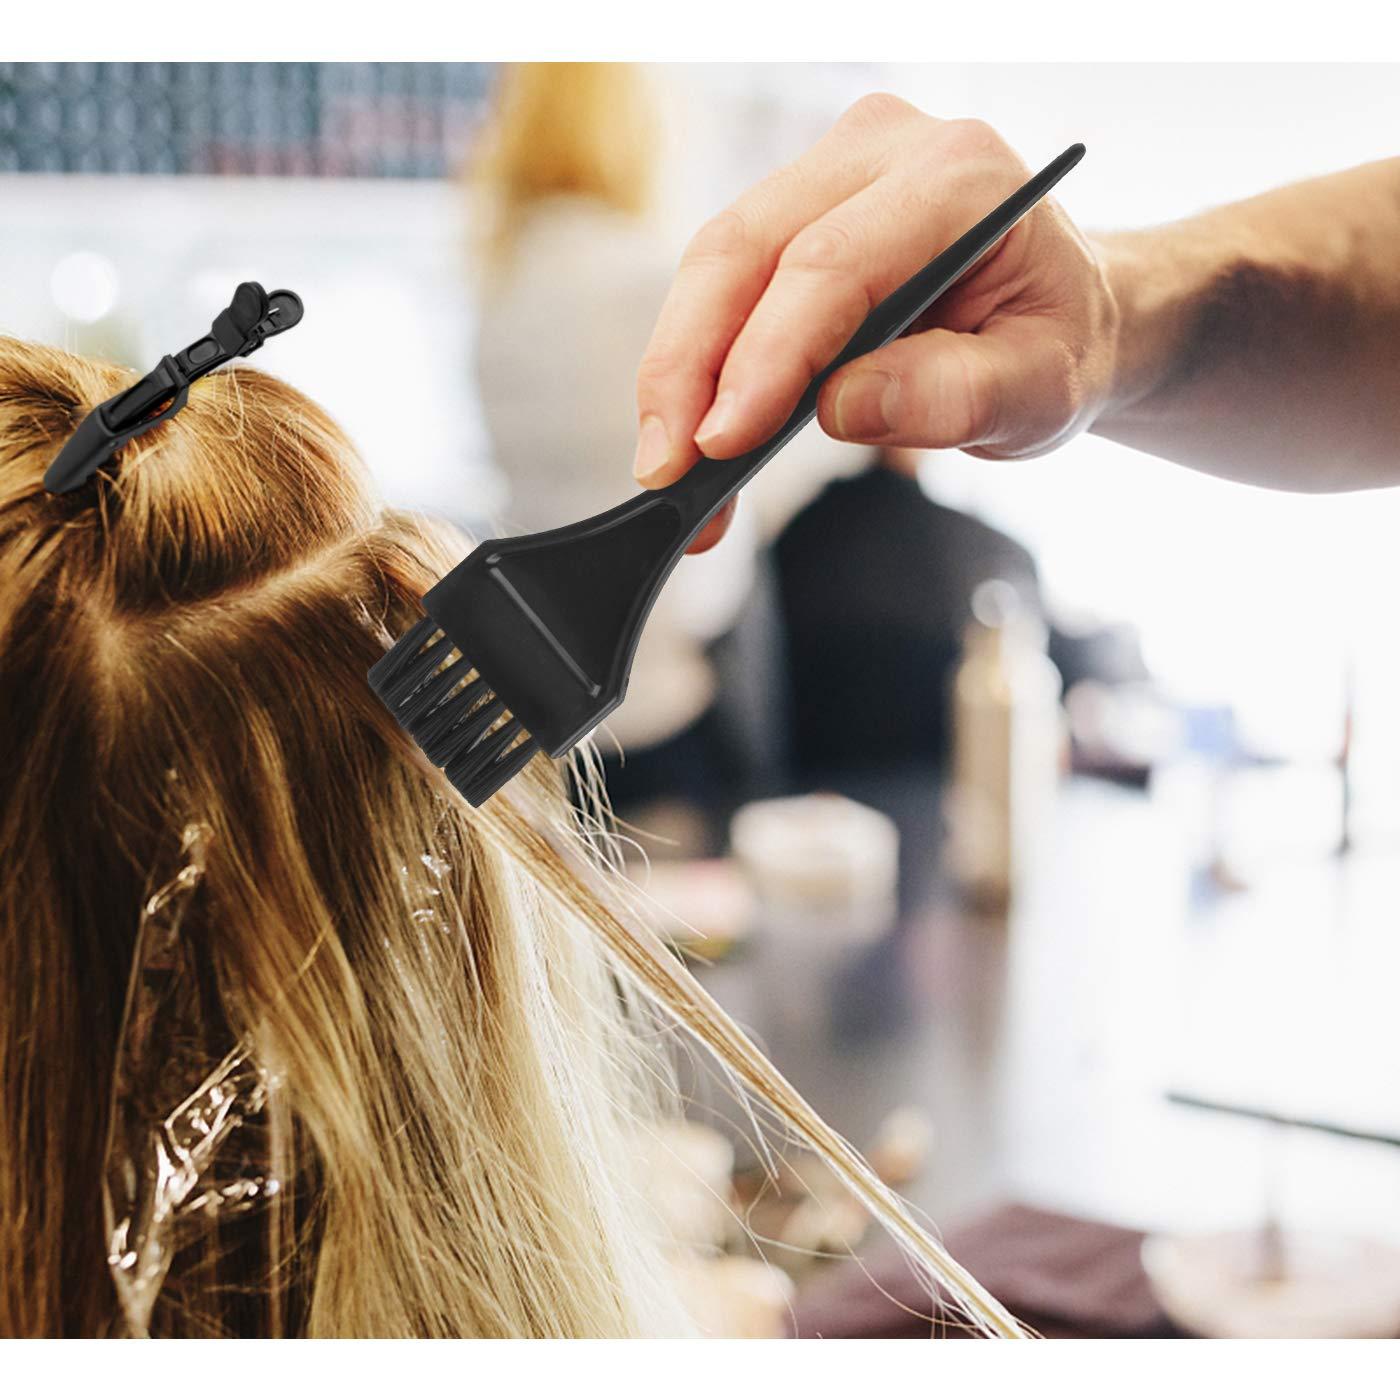 47 Pieces Hair Dye Coloring Kit Hair Tinting Bowl Dye Brush, Ear Cover, Gloves for Hair Coloring Bleaching Hair Dryers DIY Salon Hair Dye Tools Hair Dye Tools : Beauty